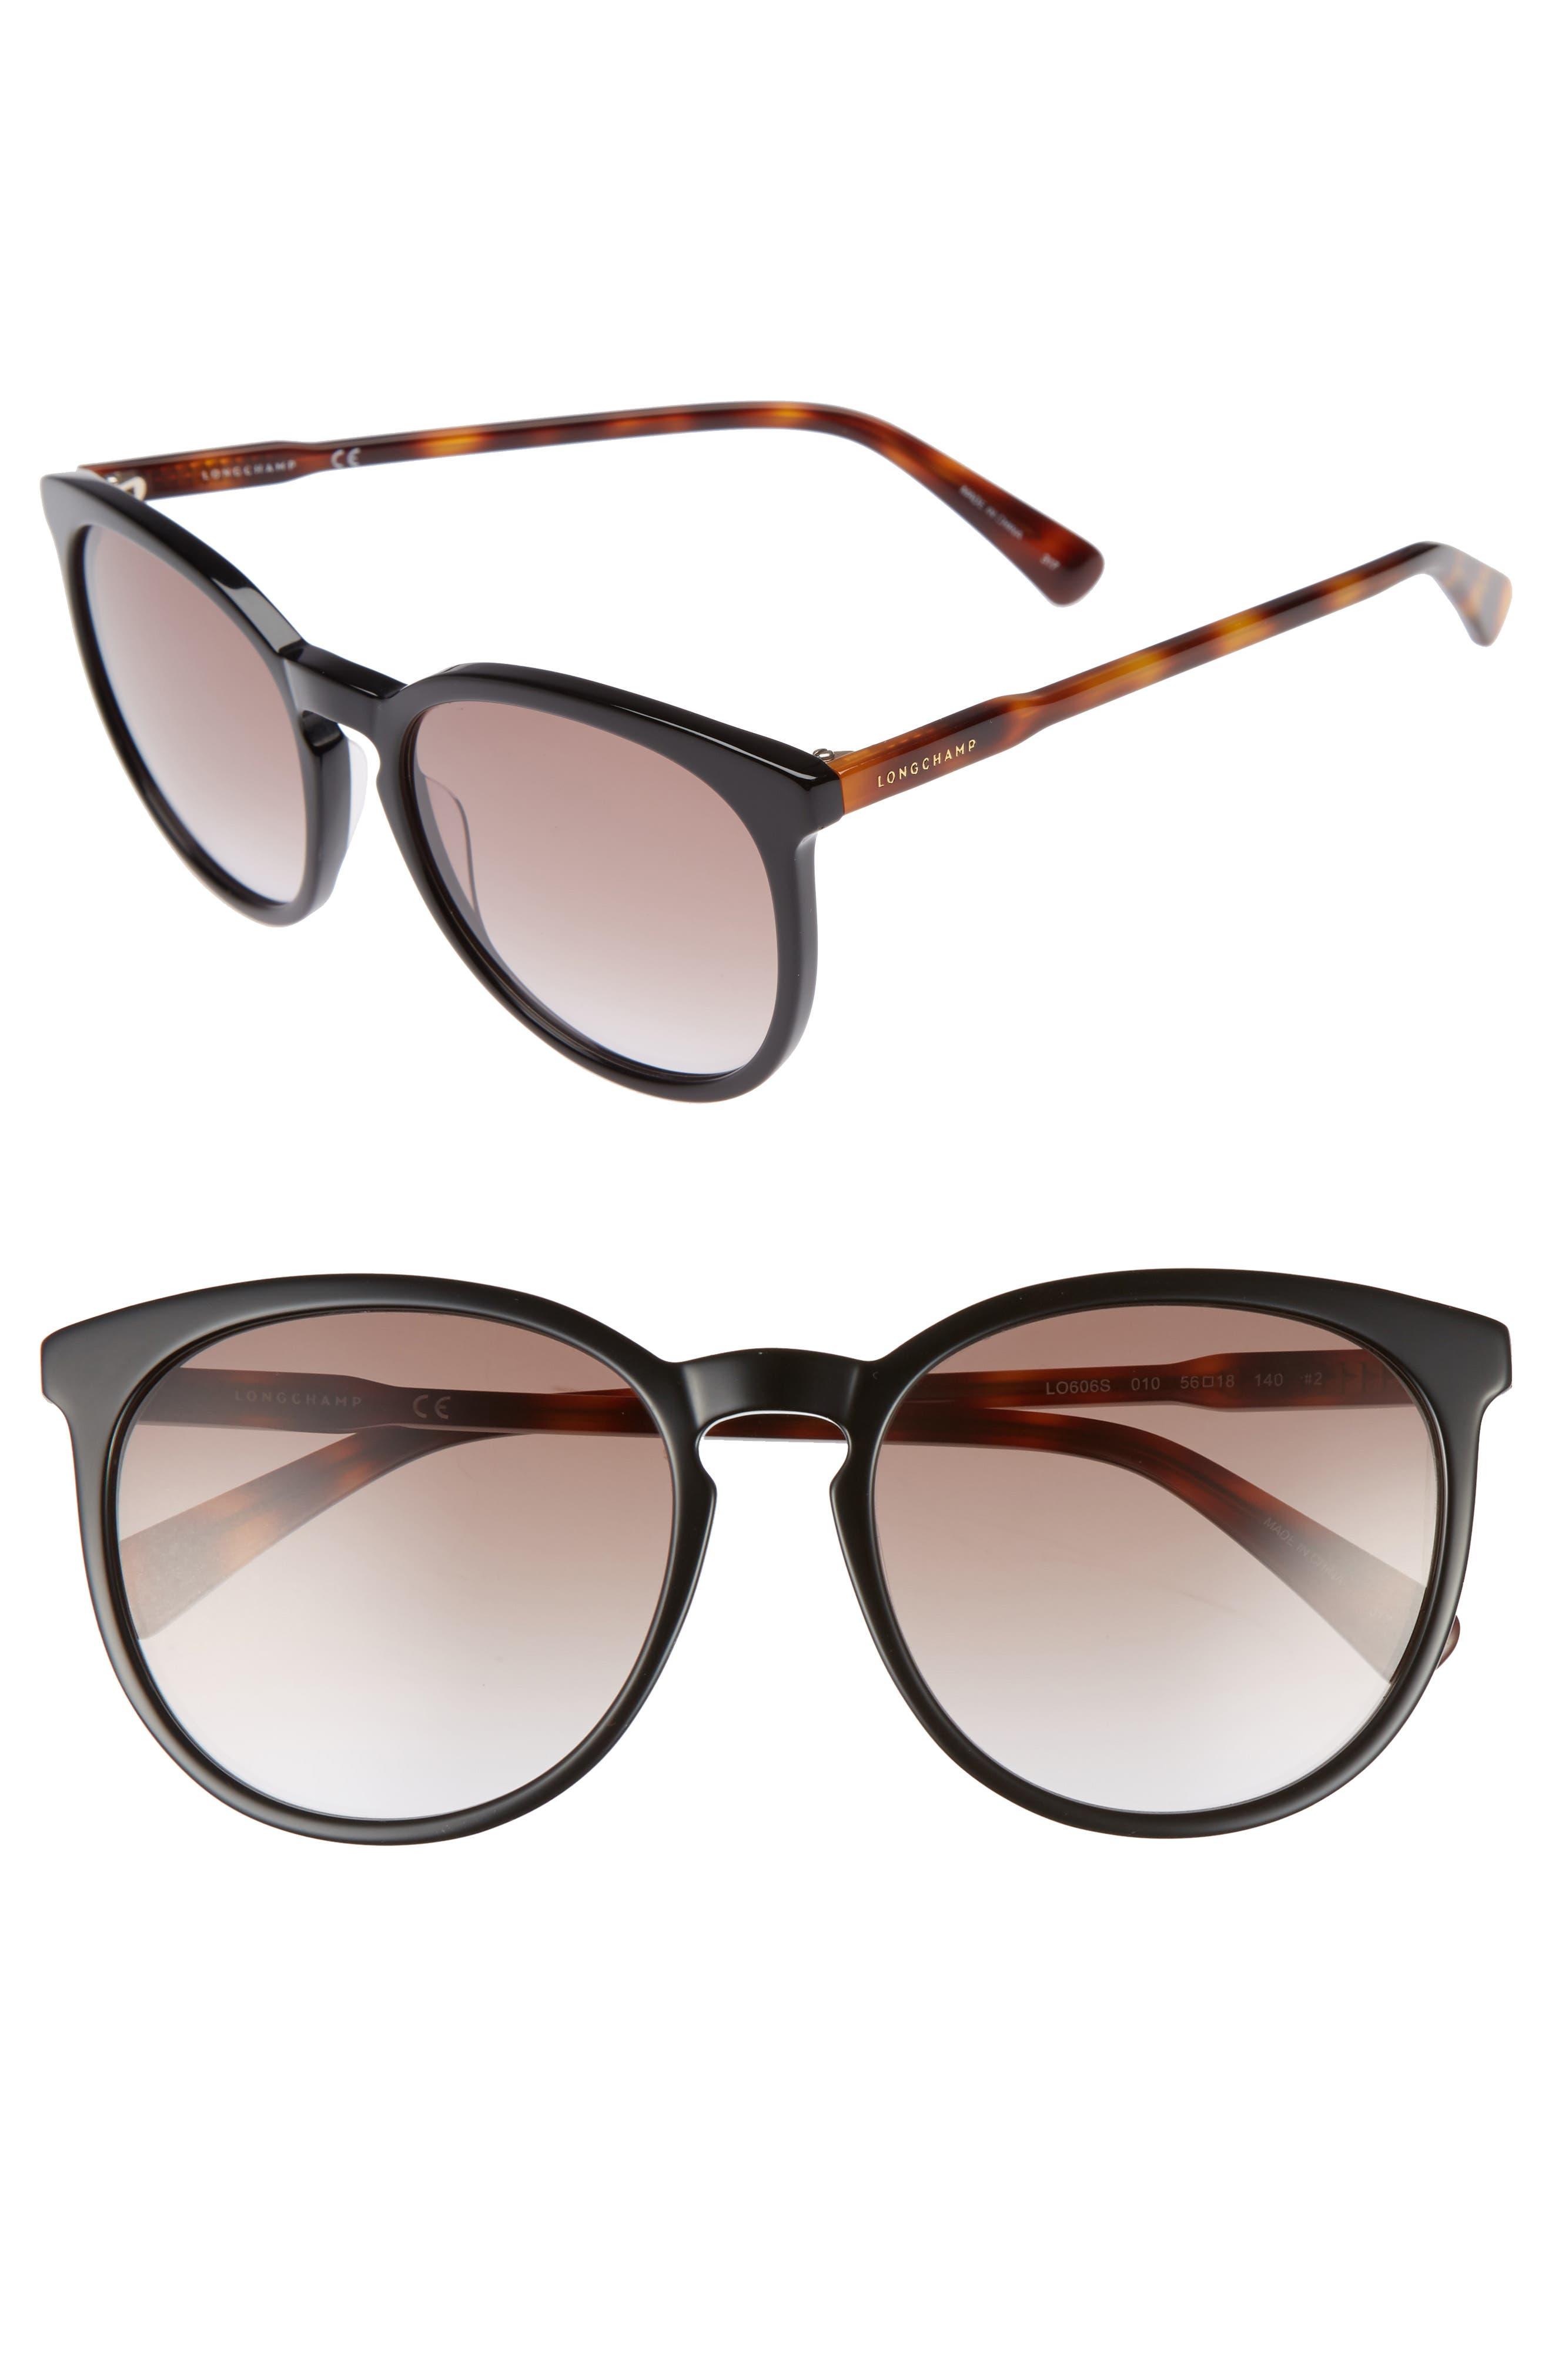 56mm Round Sunglasses,                             Main thumbnail 1, color,                             BLACK/ HAVANA